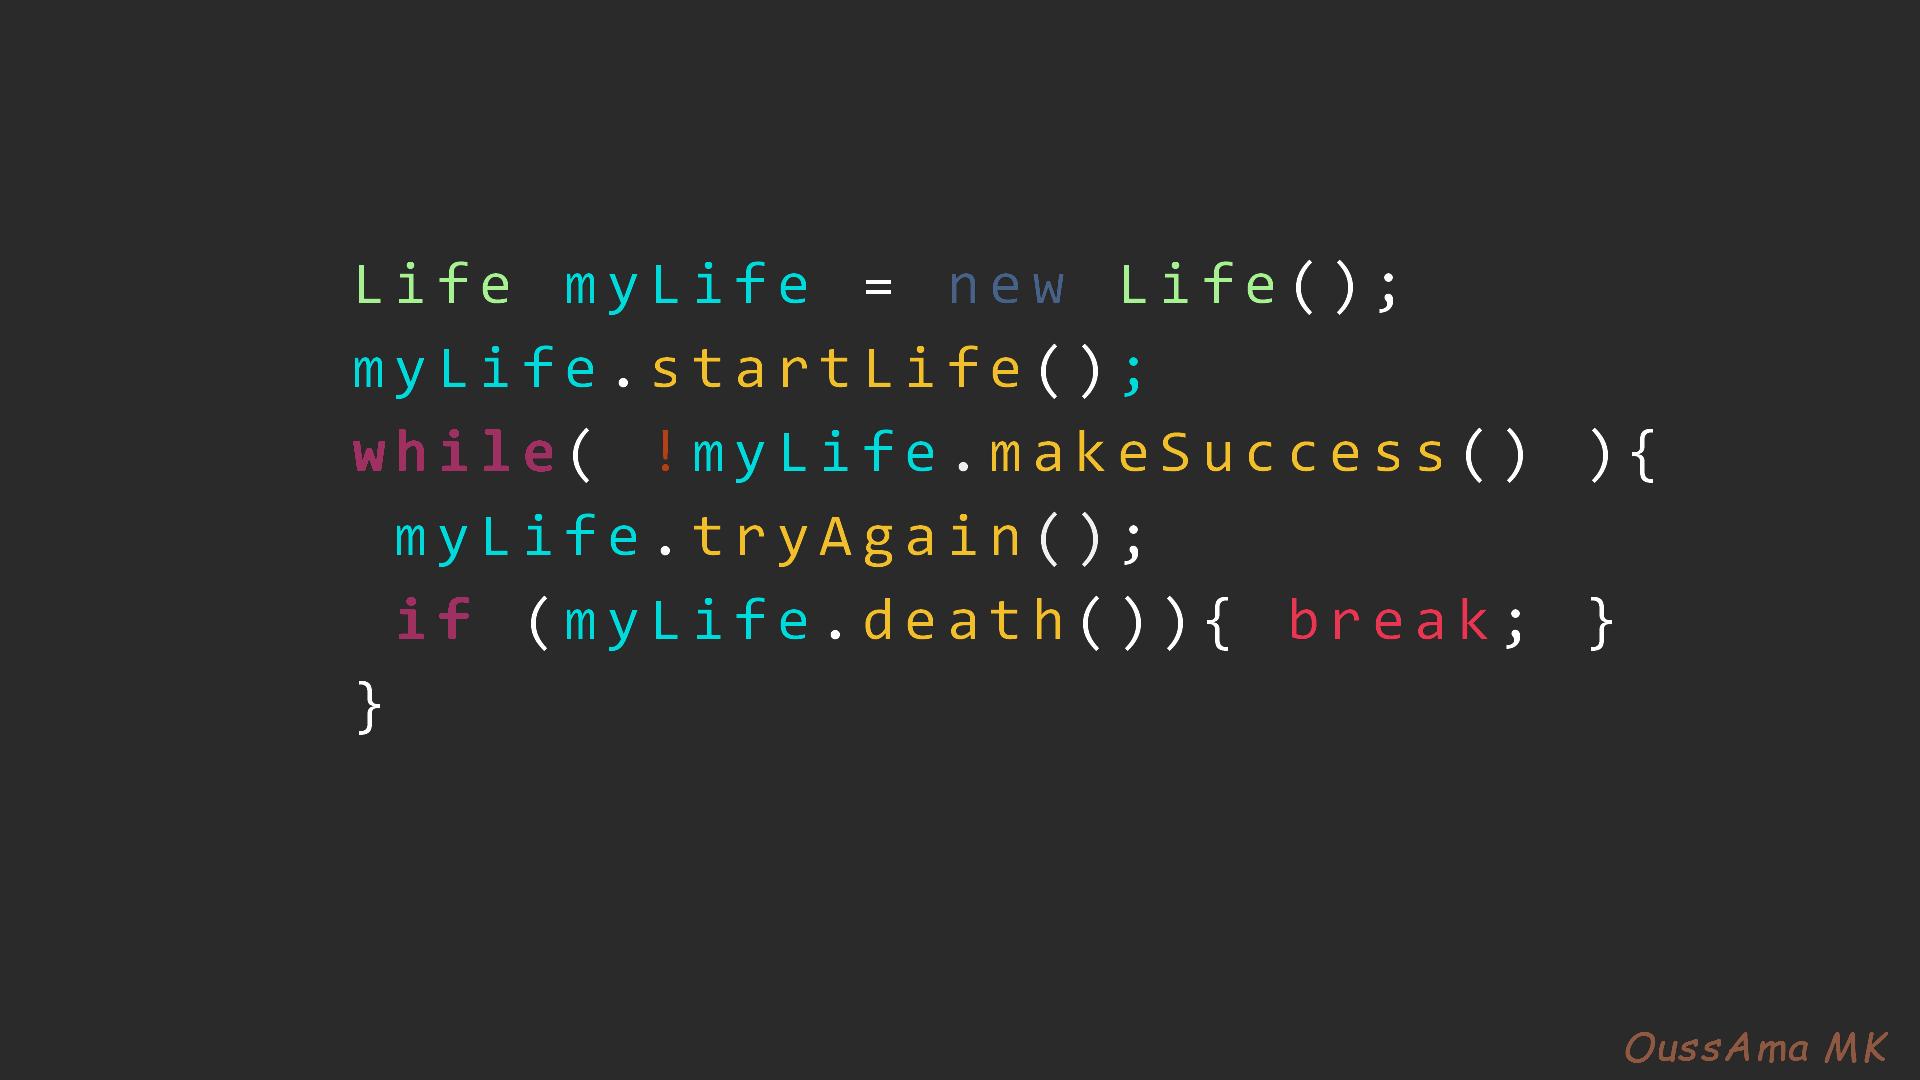 Wallpaper Code Java Programming Life 1920x1080 Oussmk1309 1920417 Hd Wallpapers Wallhere